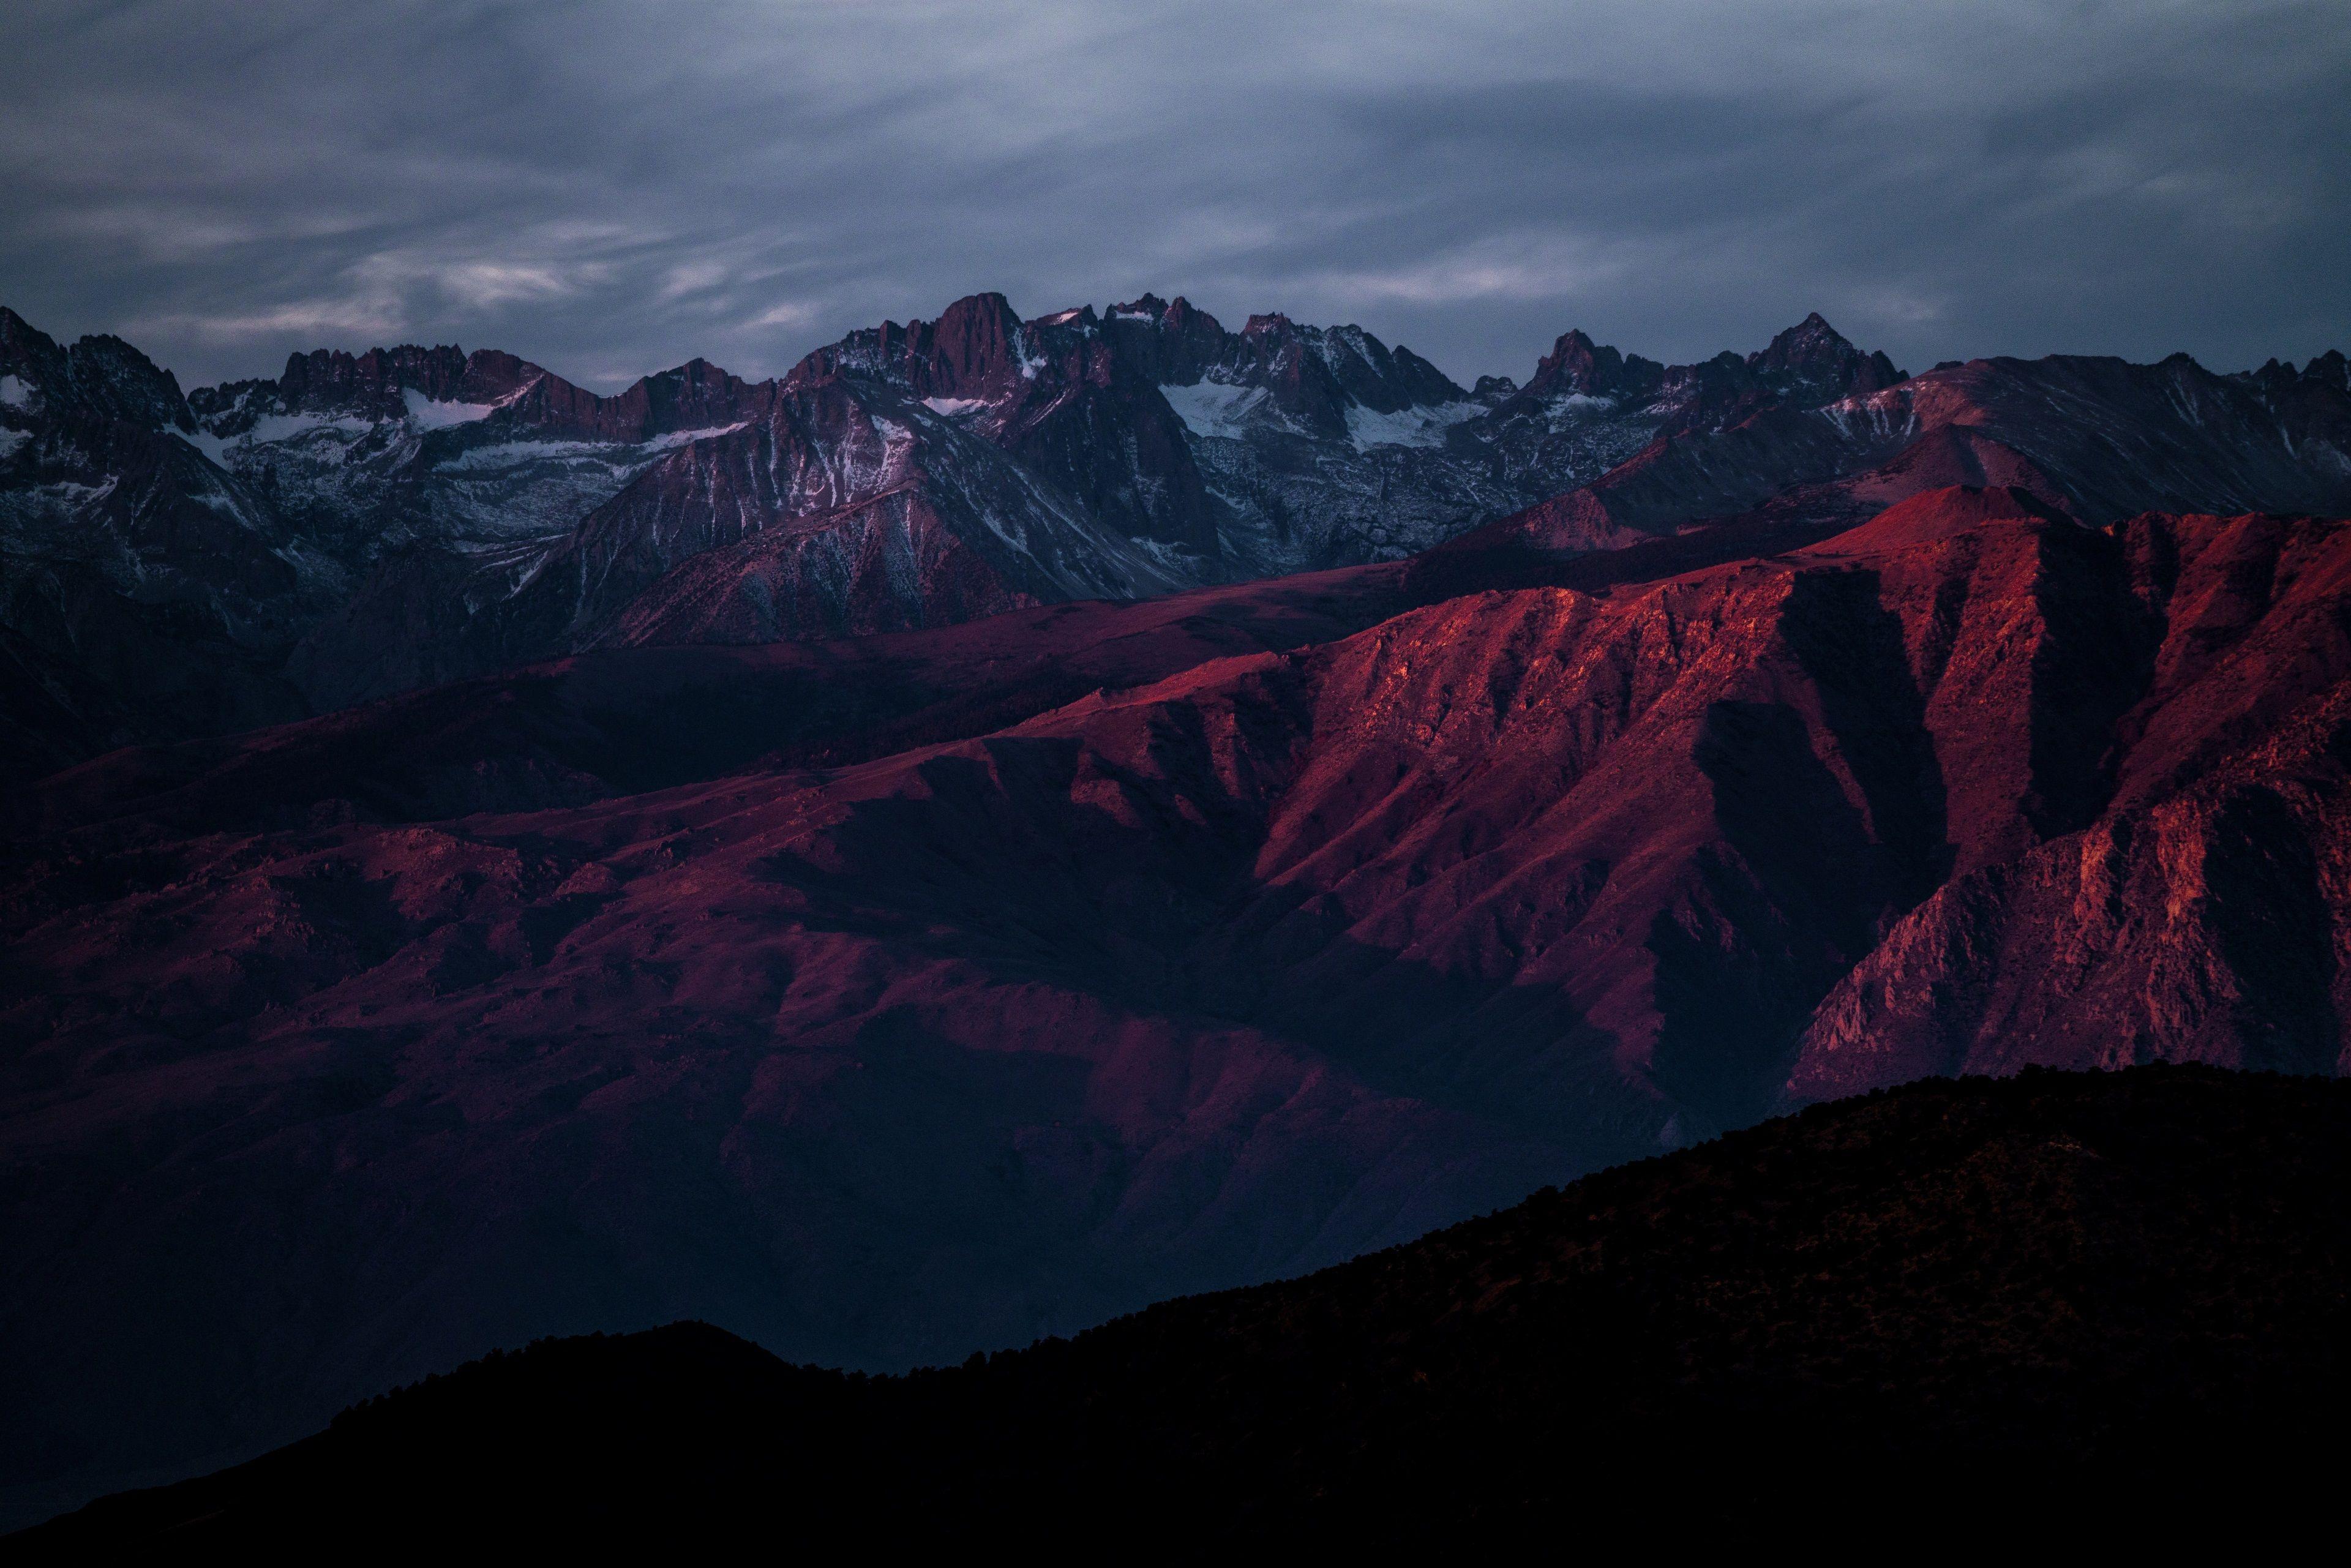 3840x2561 Mountains 4k Desktop Wallpaper High Resolution Free Download Mountain Wallpaper Dark Wallpaper Breathtaking Photography